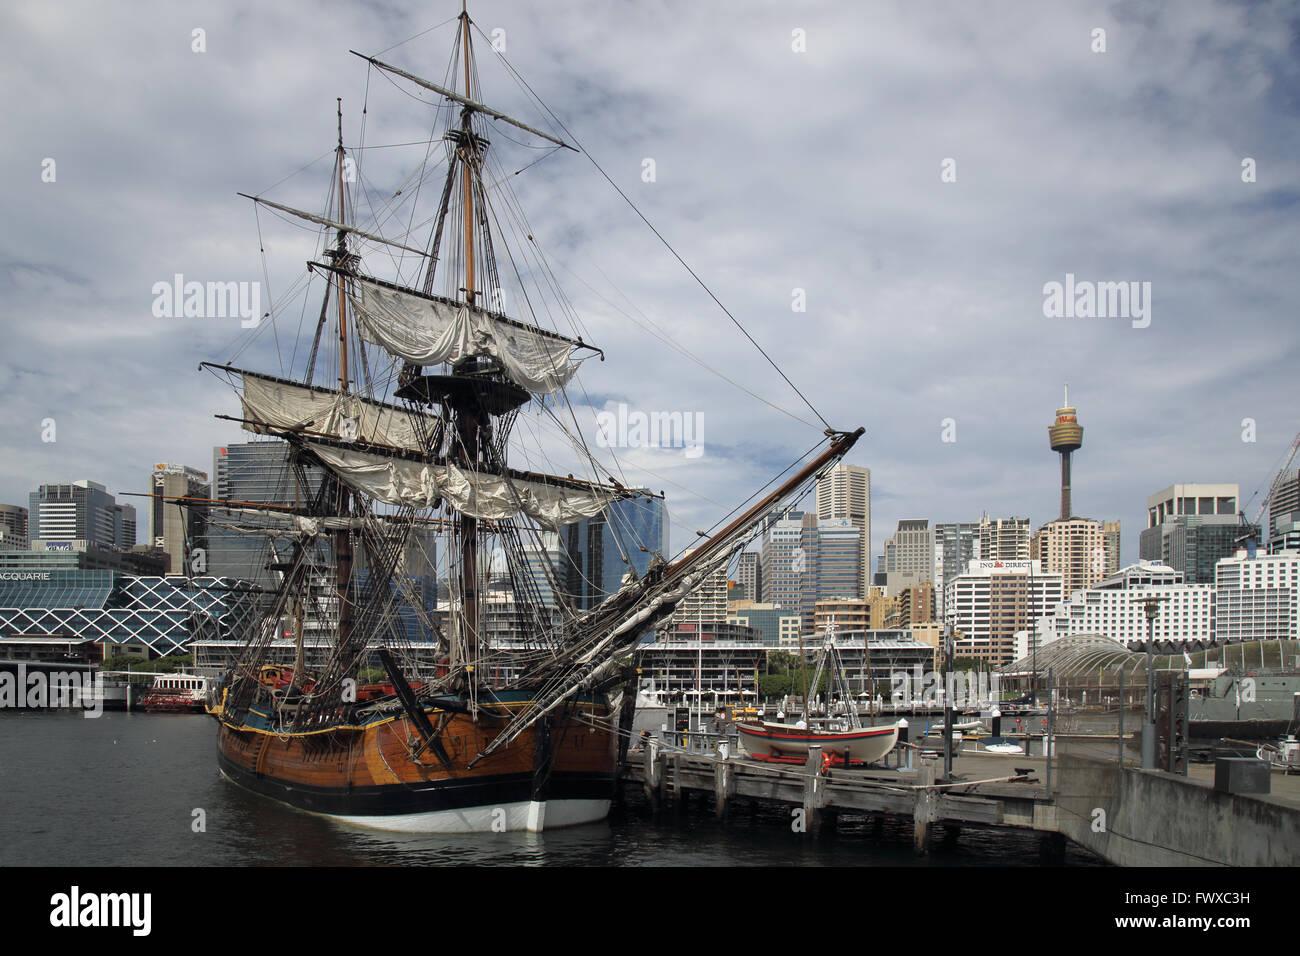 australian national maritime museum in sydney darling harbour australia - Stock Image